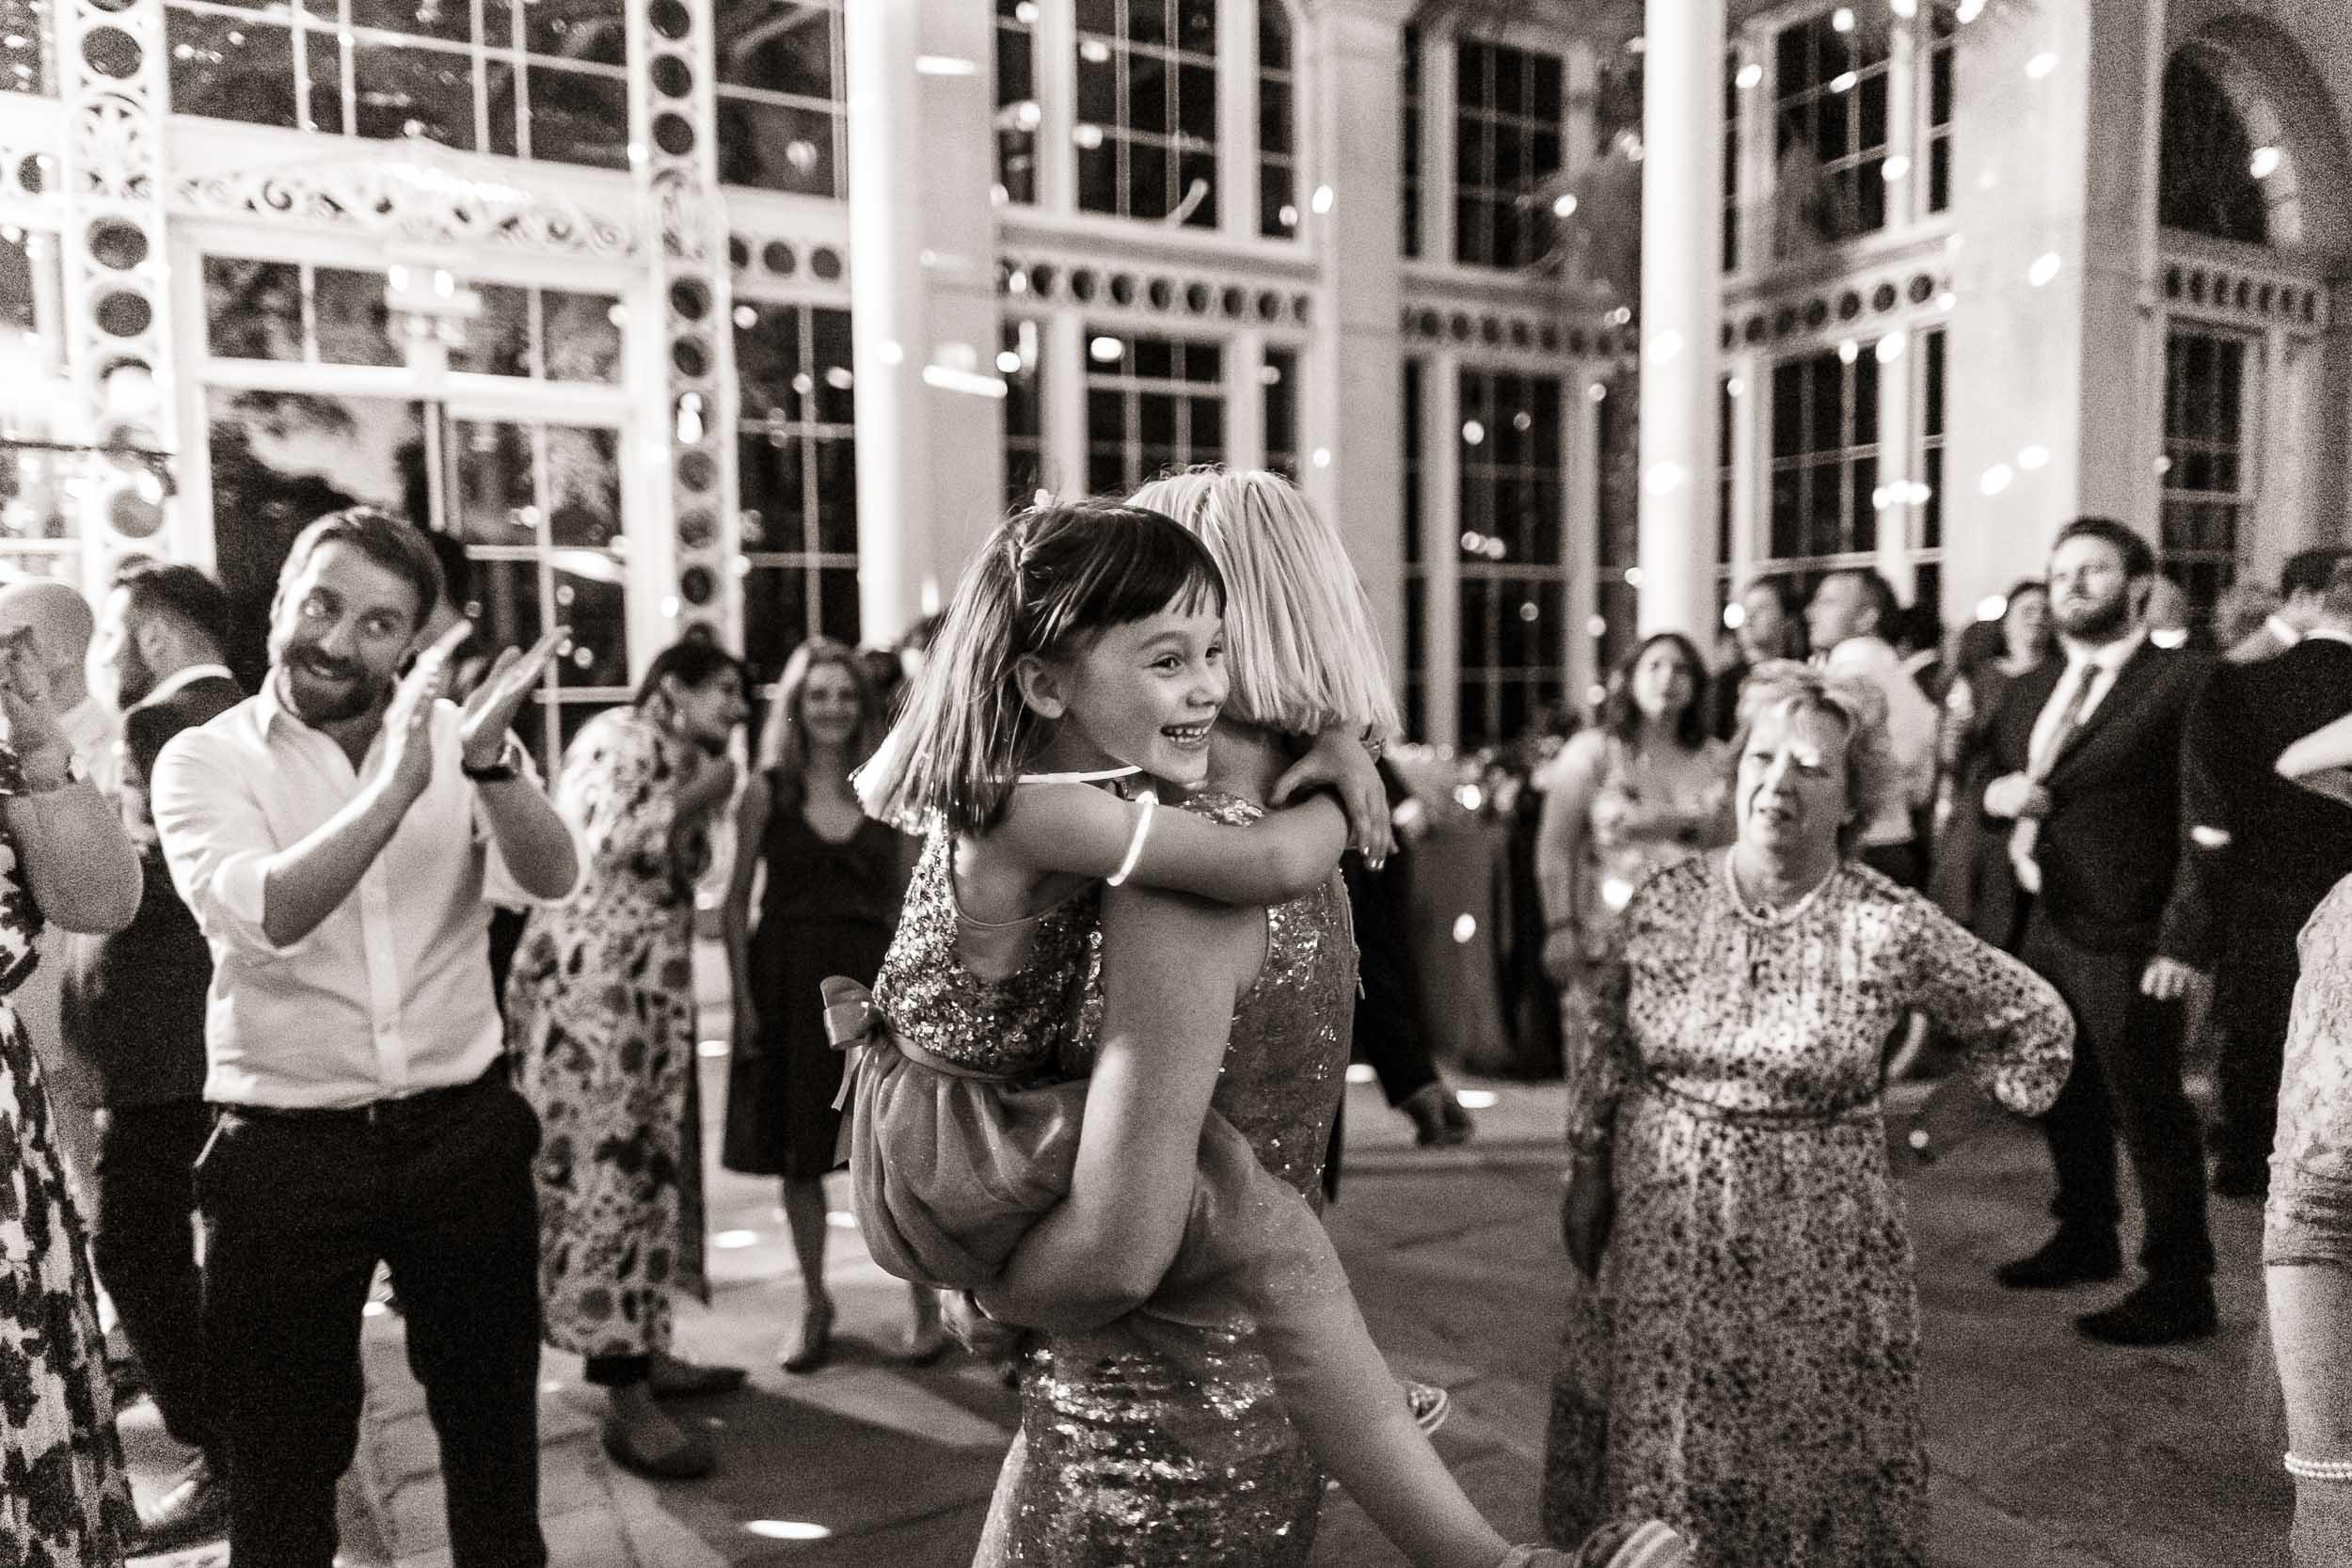 syon-house-wedding-photographer-london 170.jpg